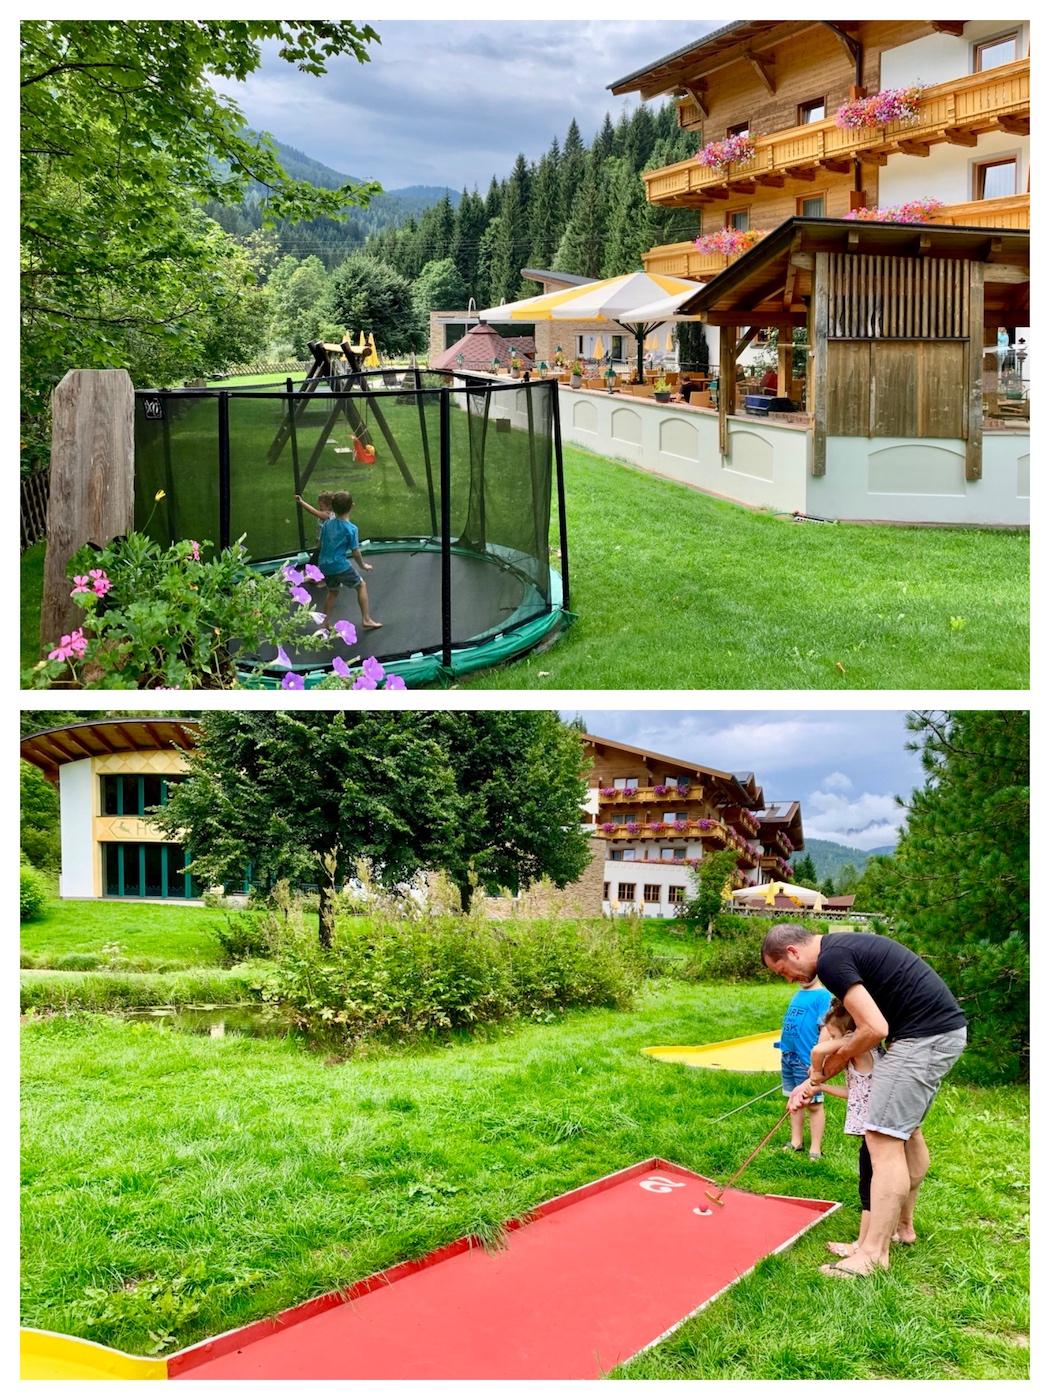 Filzmoos Alpenhof Familienhotel Wanderurlaub Pongau